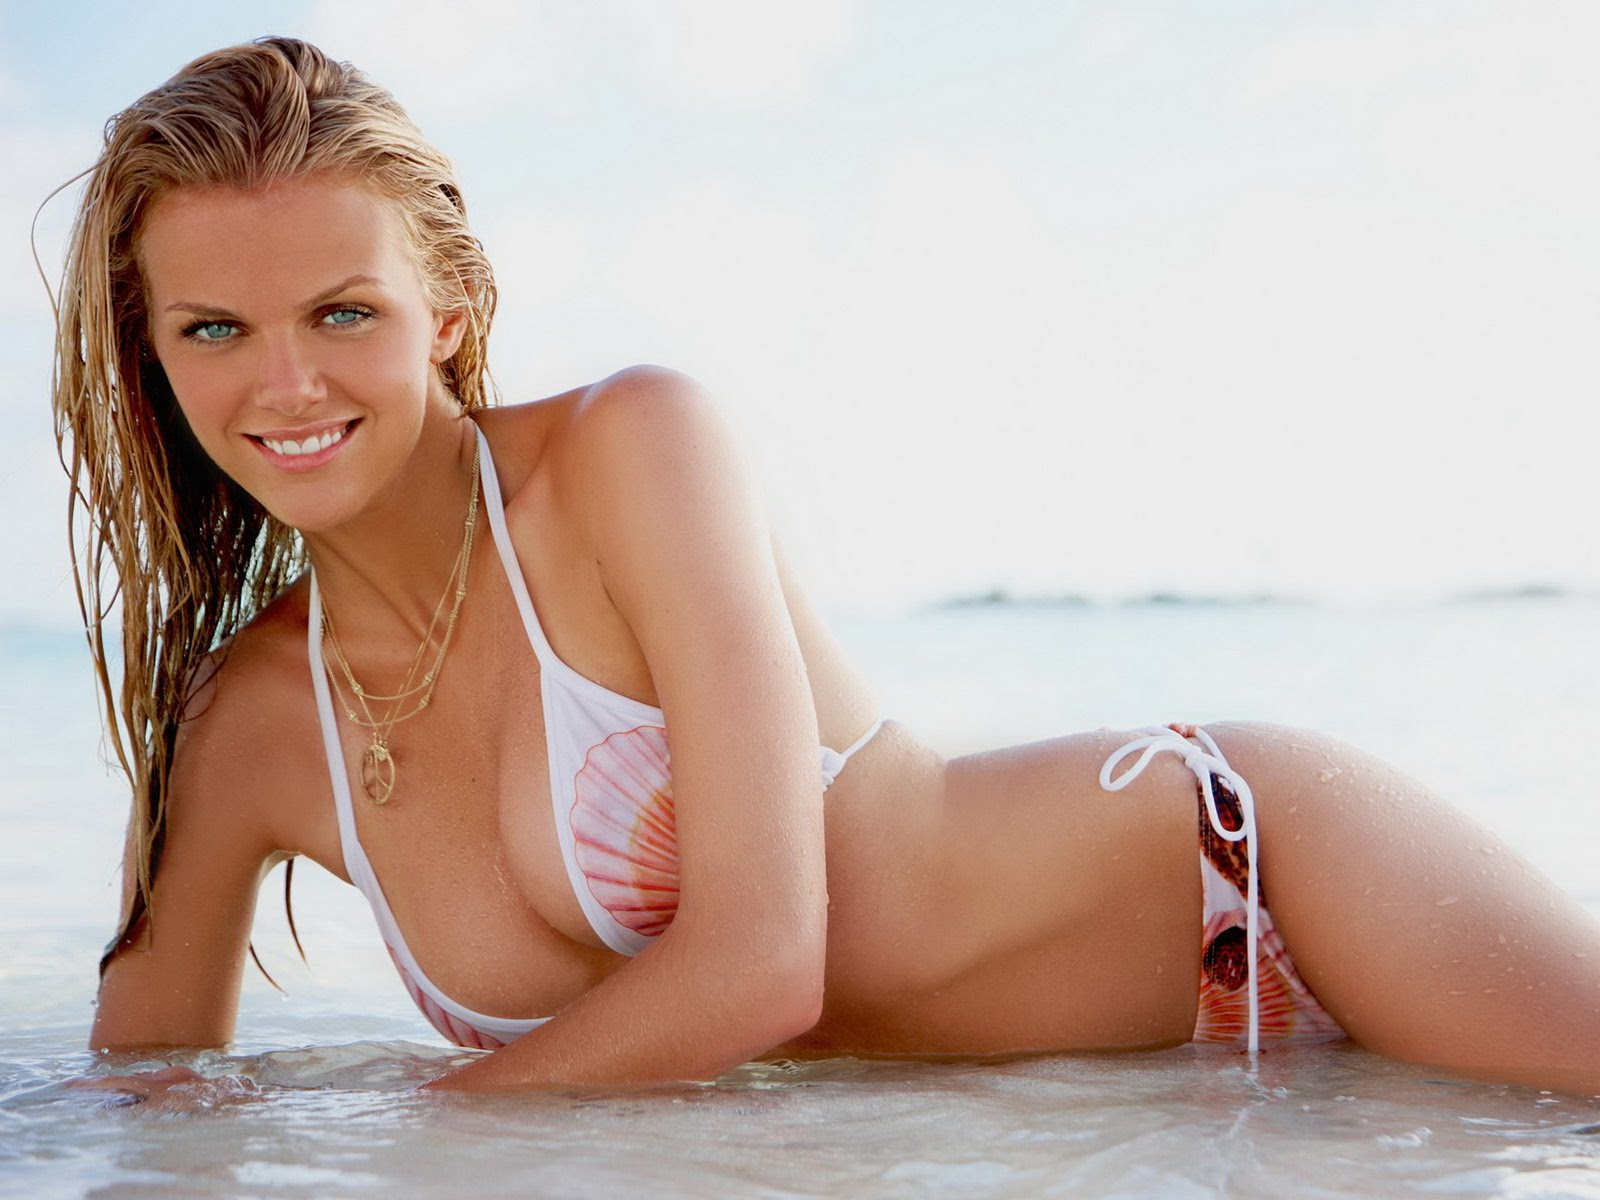 http://3.bp.blogspot.com/-xPnuzAkziHw/Tqvn6MVMpbI/AAAAAAAABu0/wEY8Fd6iCvw/s1600/brooklyn_decker_hot_bikini_2.jpg